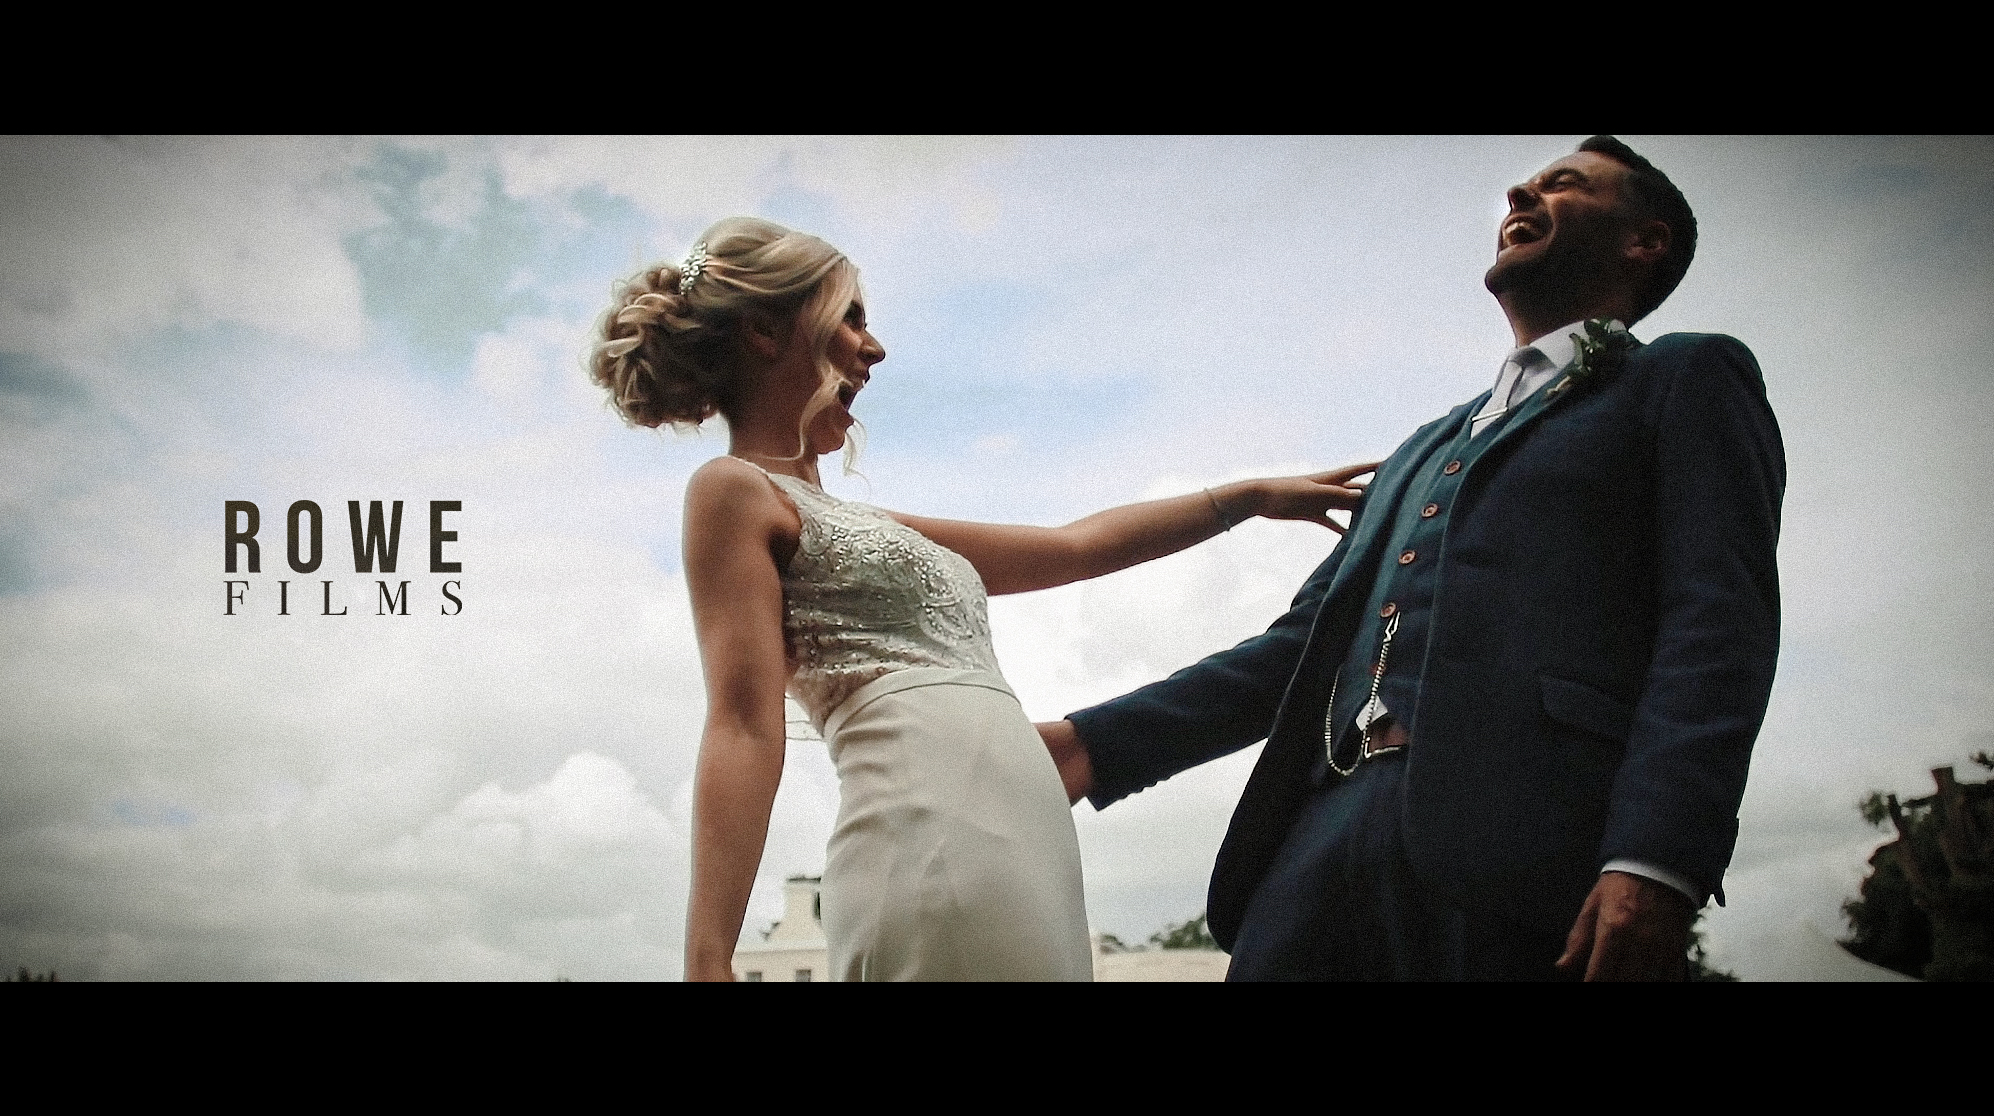 SCOTTISH WEDDING VIDEOGRAPHY